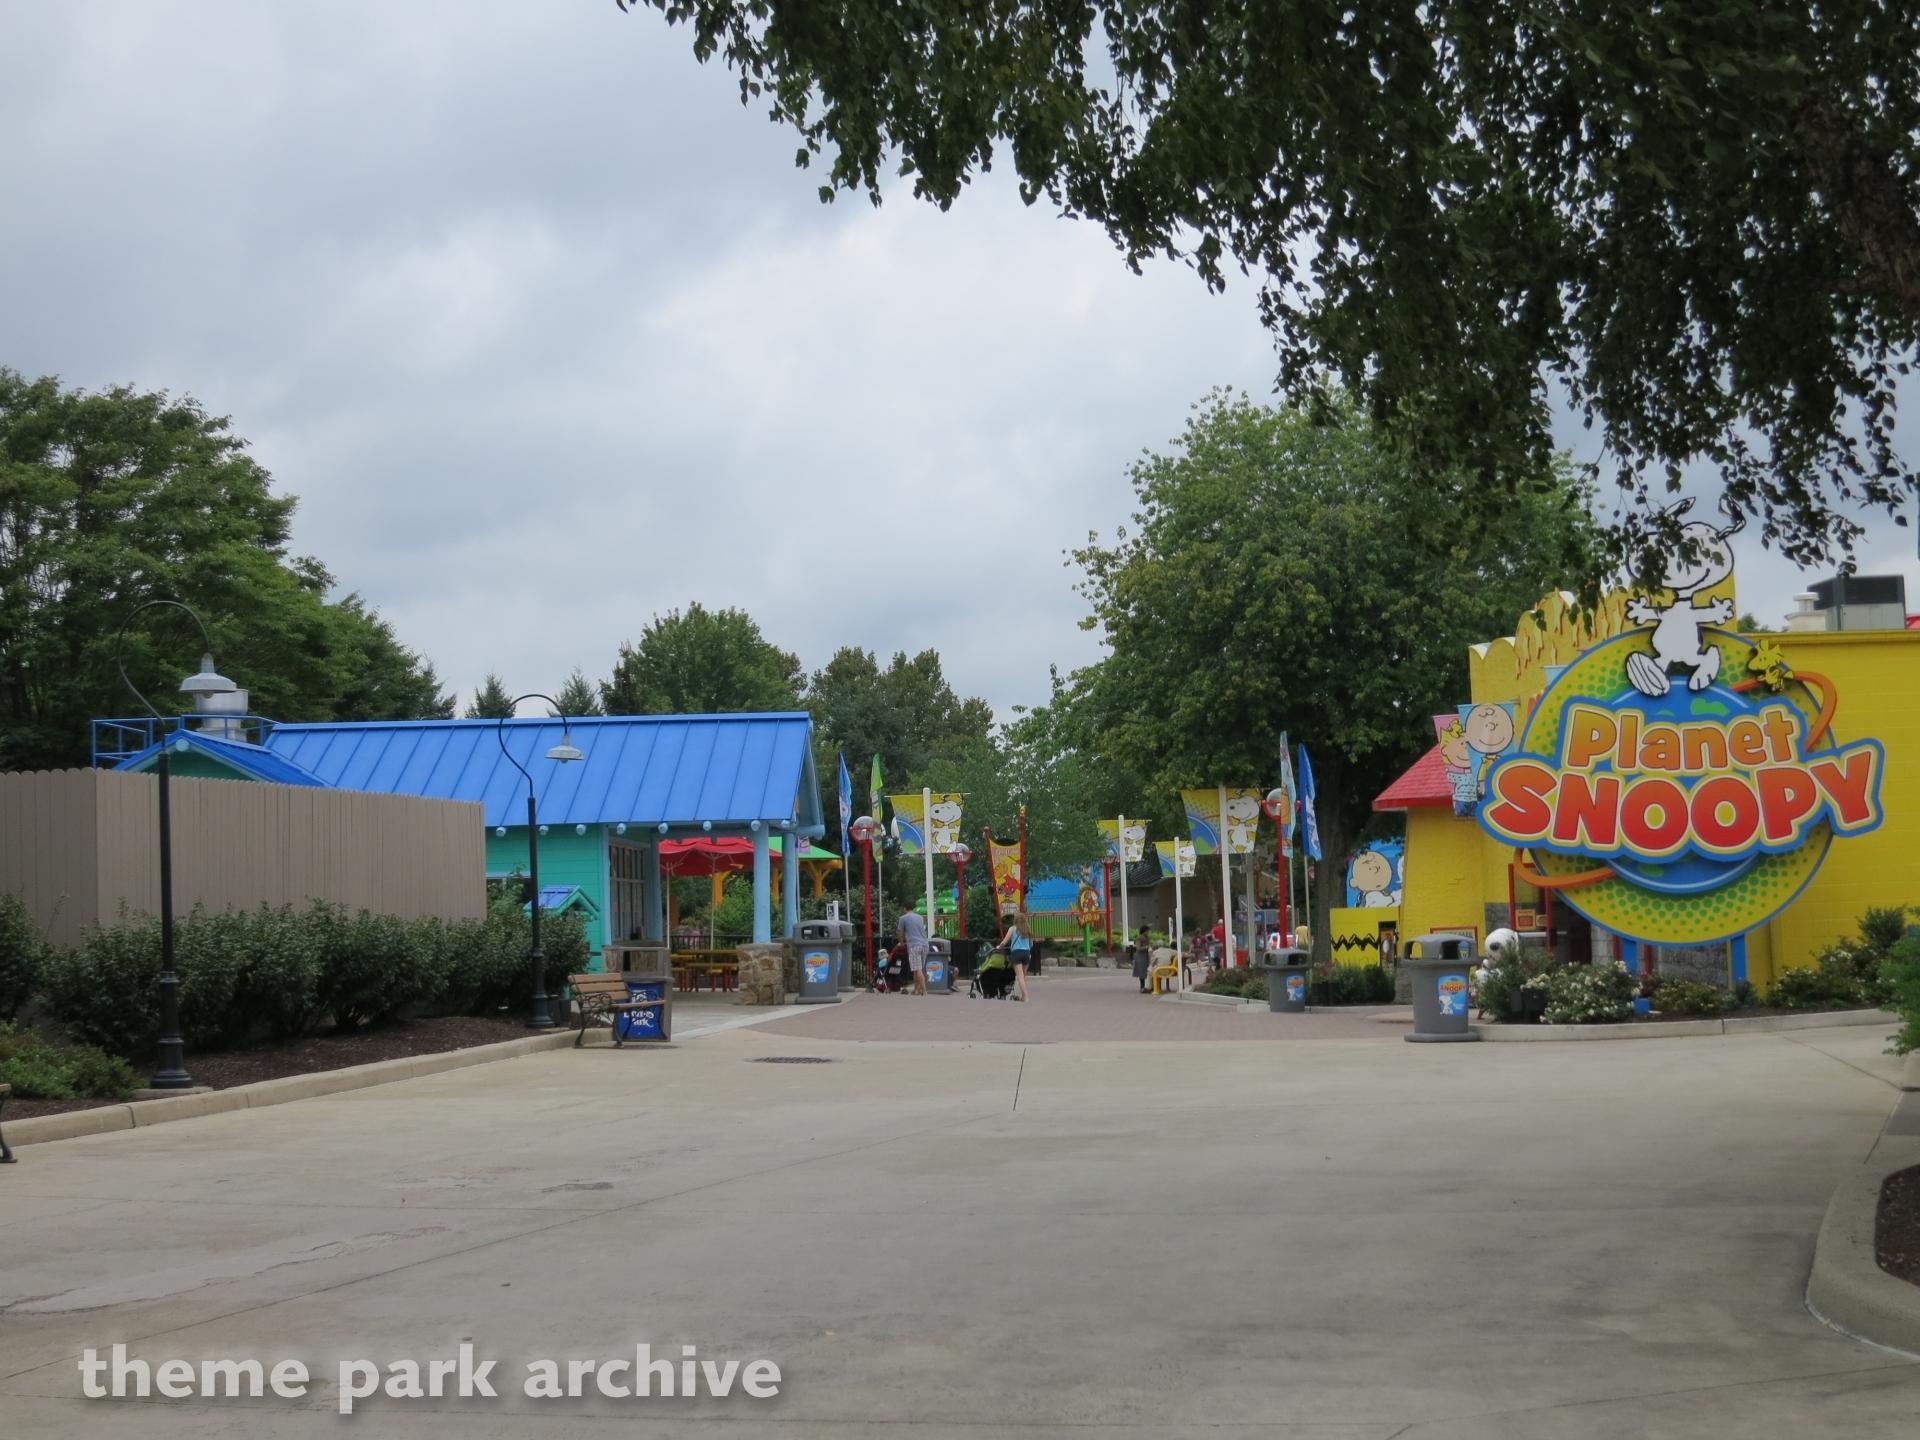 Planet Snoopy at Dorney Park